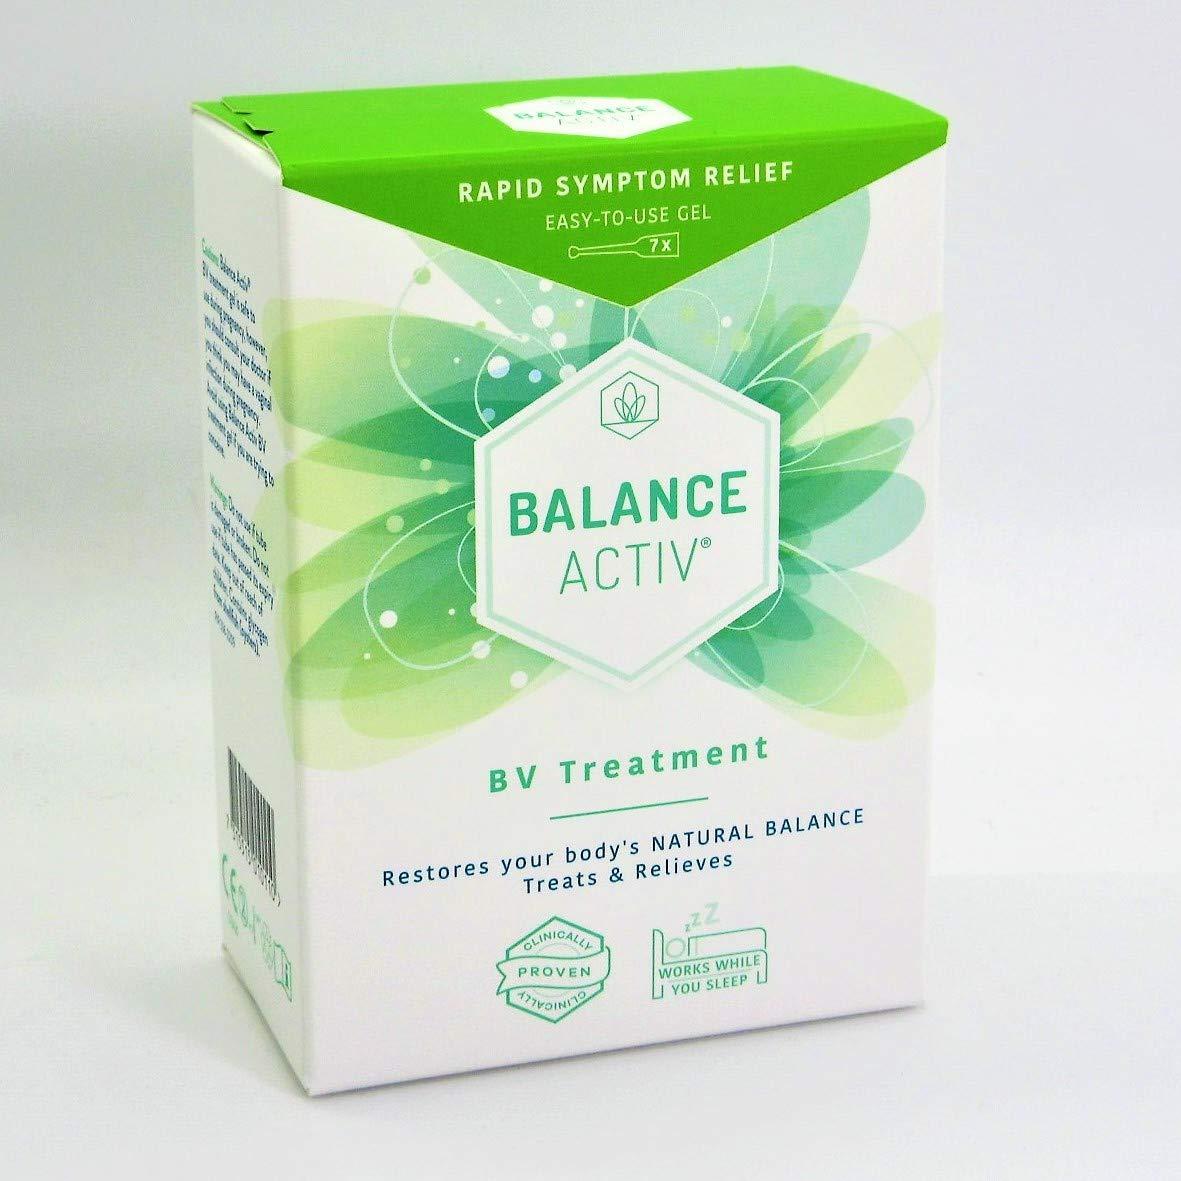 (3 Pack) - Balance Activ Lactic Acid Gel for Bacterial Vaginosis | 7 Applicator Applicators | 3 Pack - Super Saver